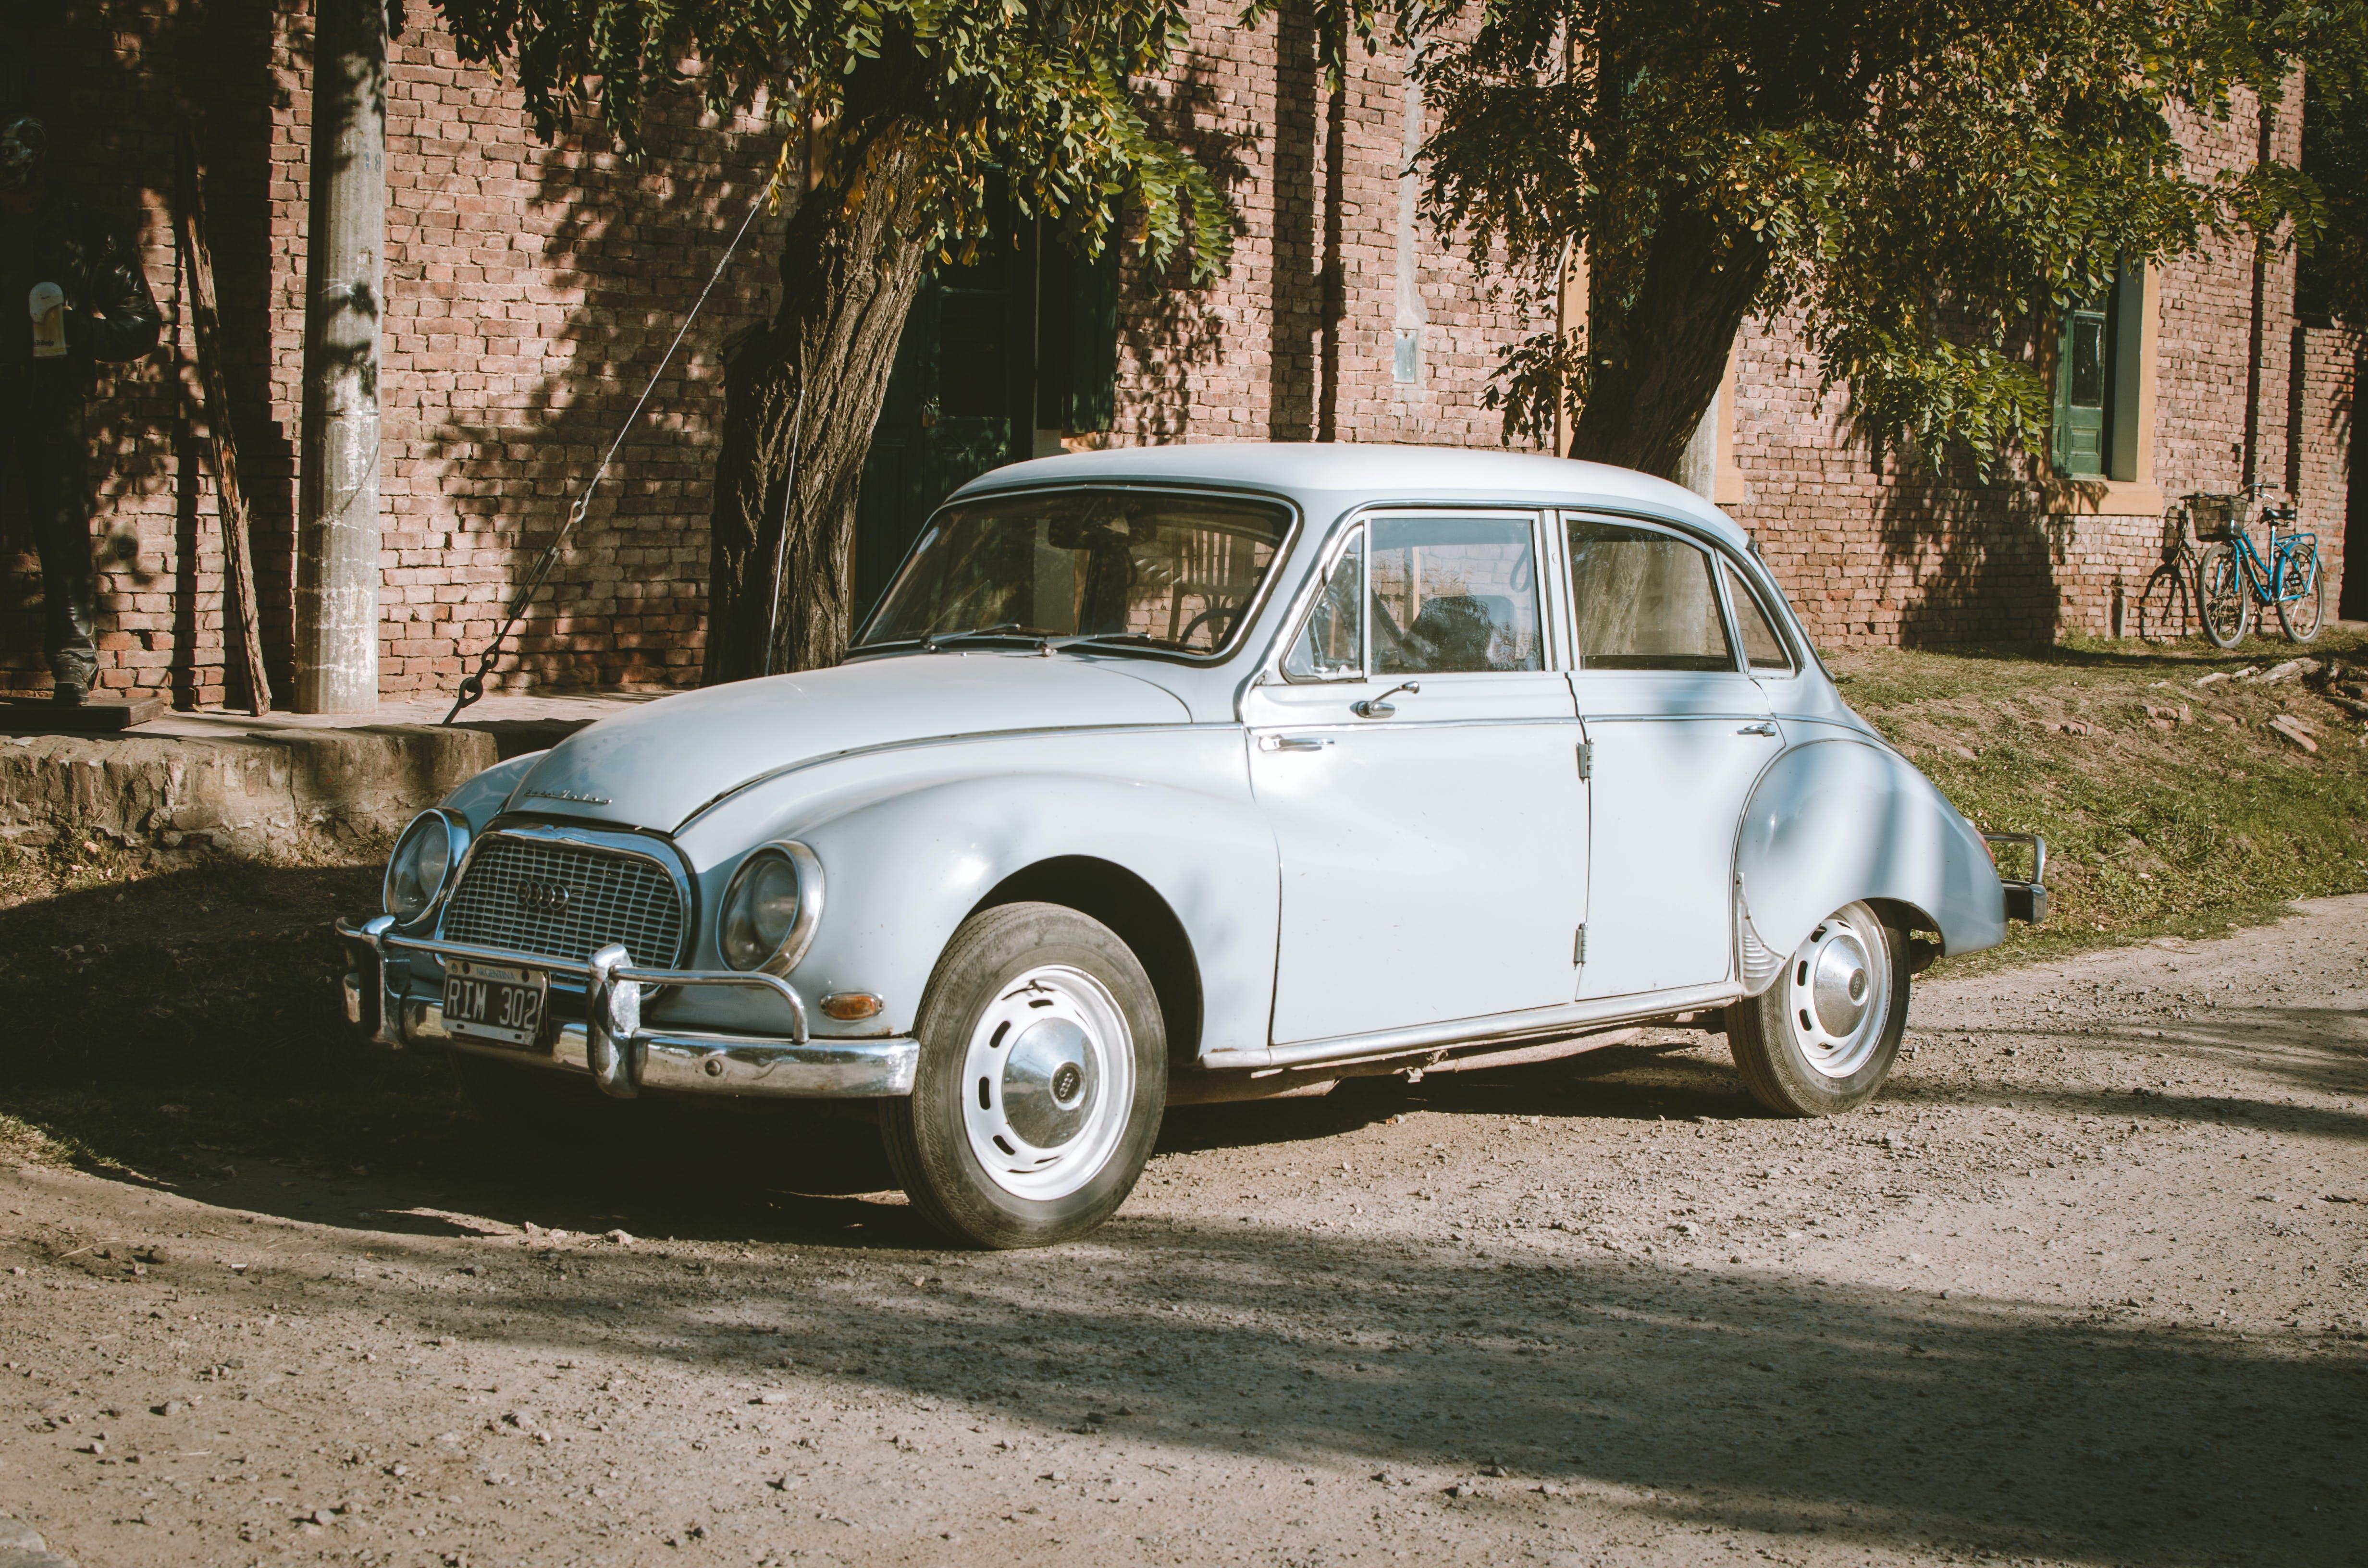 Classic Blue Sedan Near Green Leaf Trees at Daytime